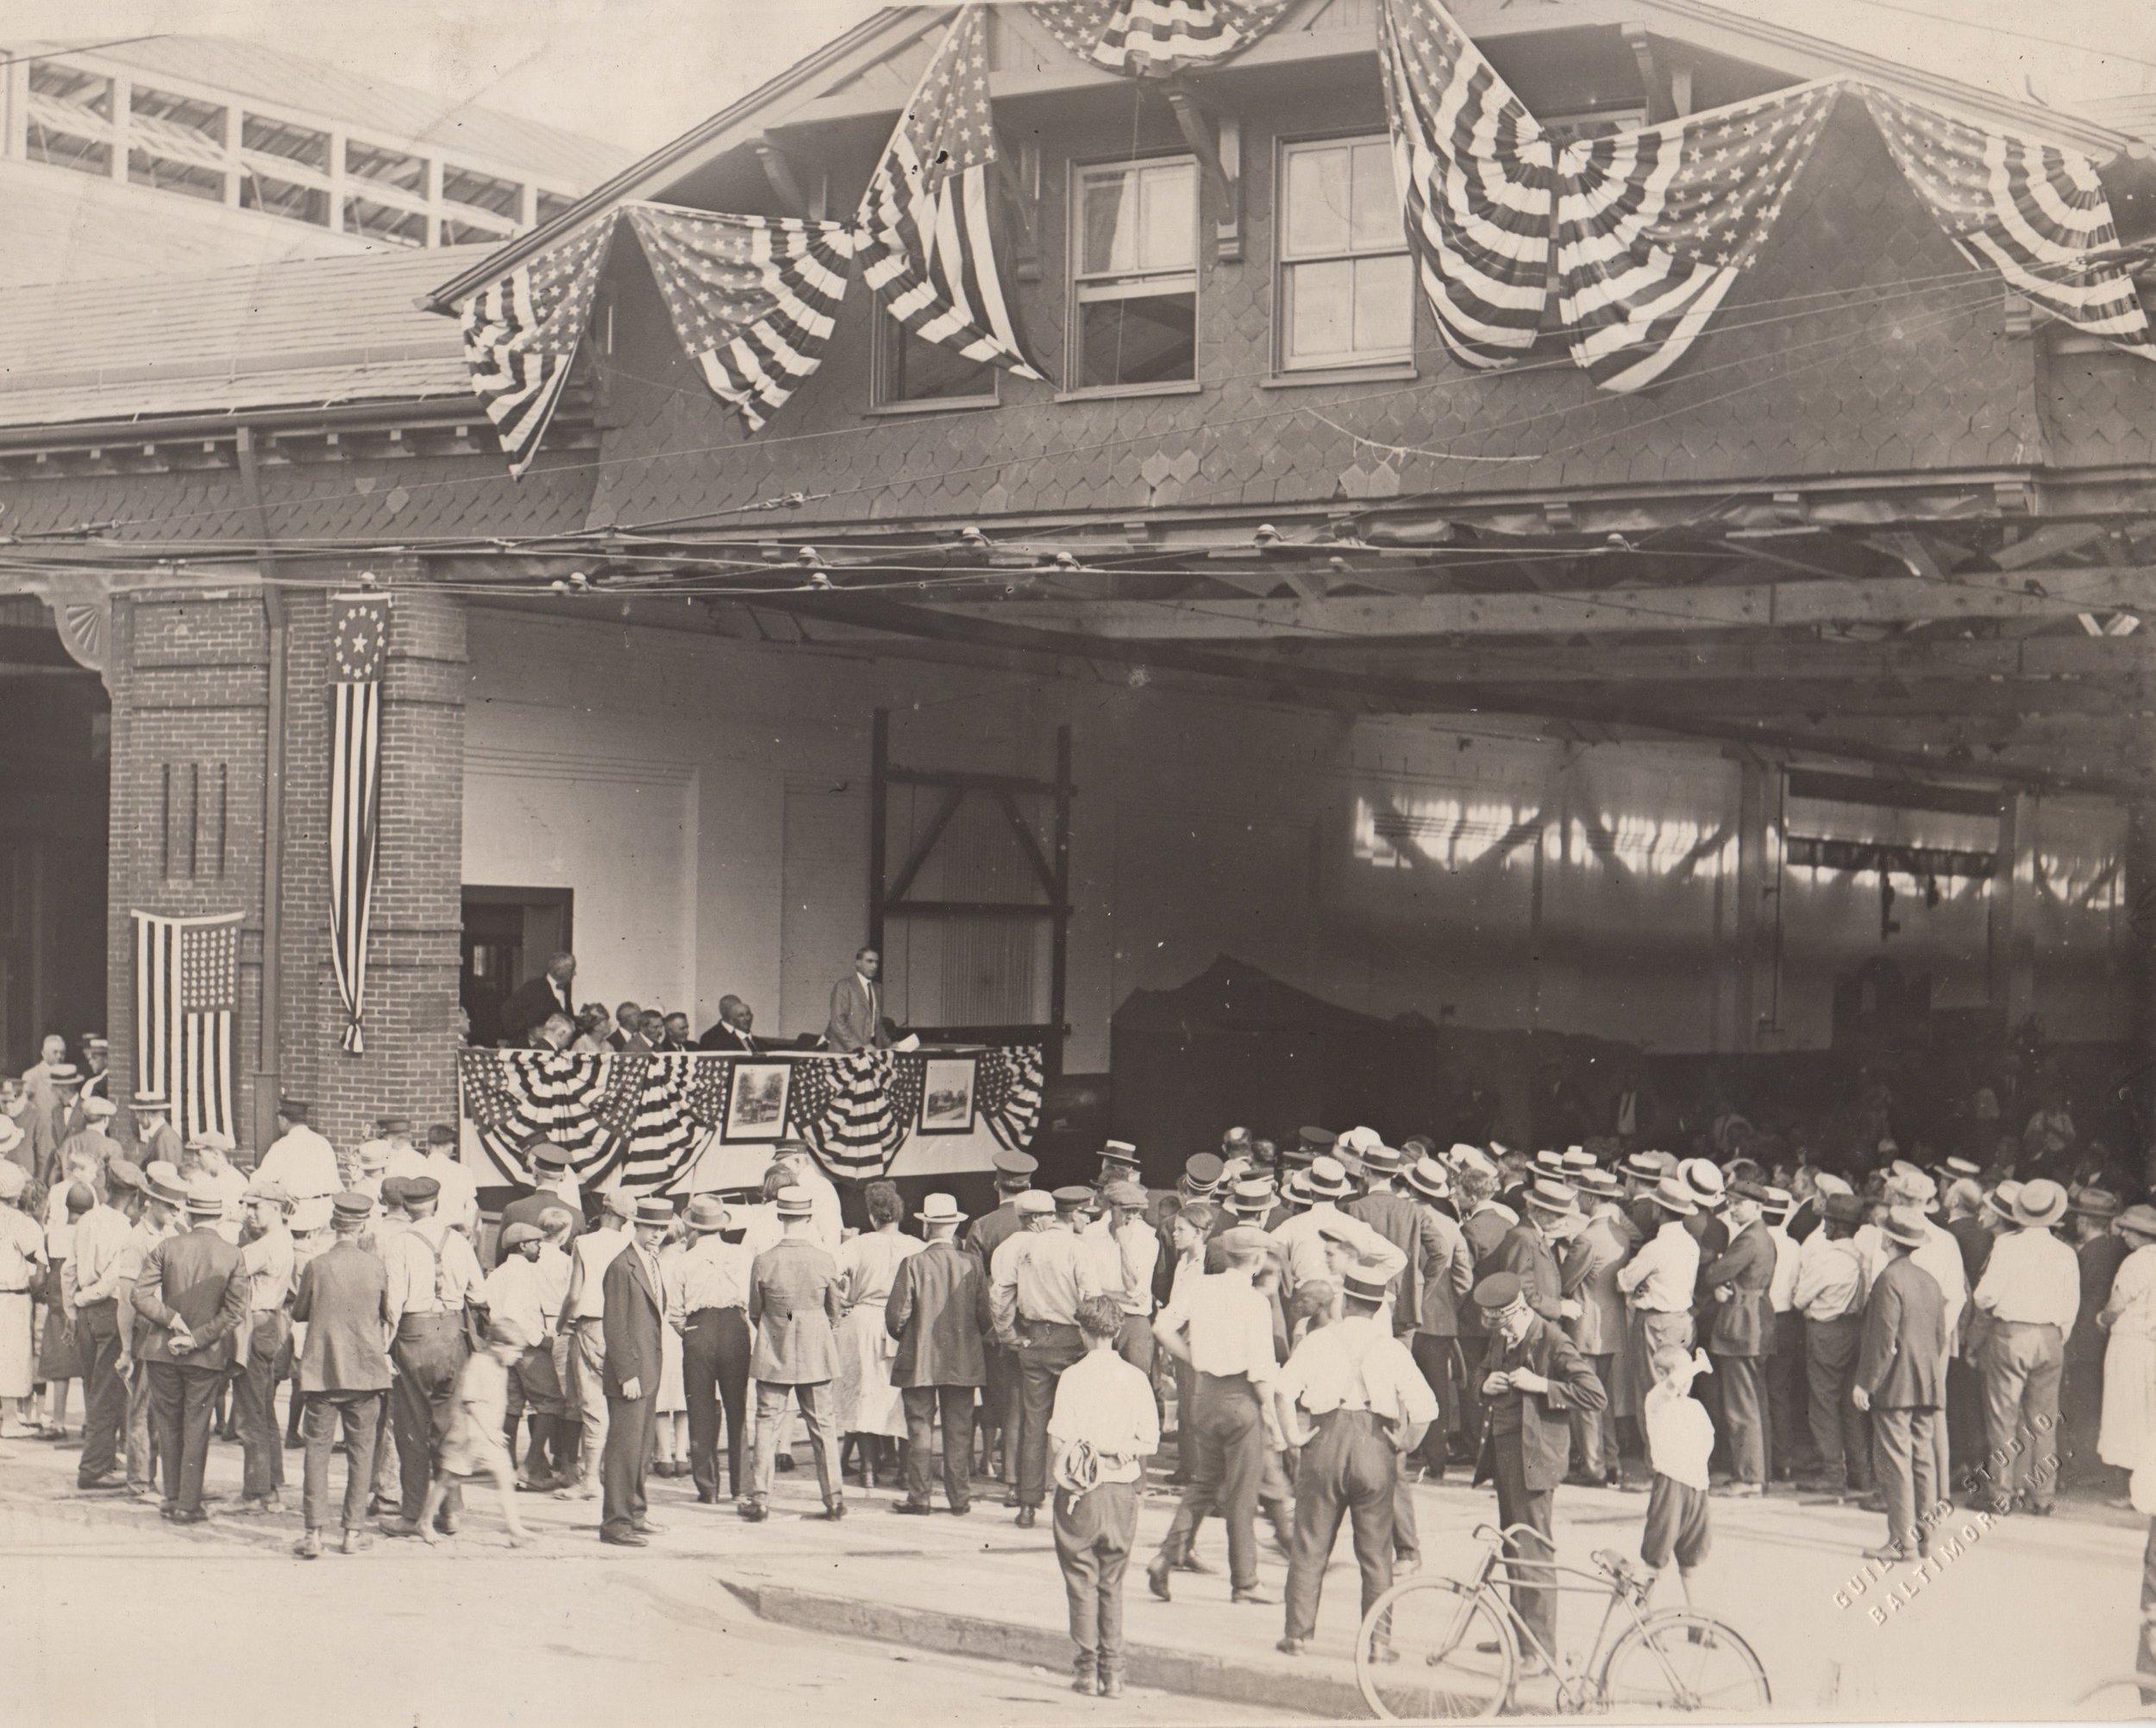 Image Credit: BSM Archive, Howard St Car House when it was Oak St Car House, 1925